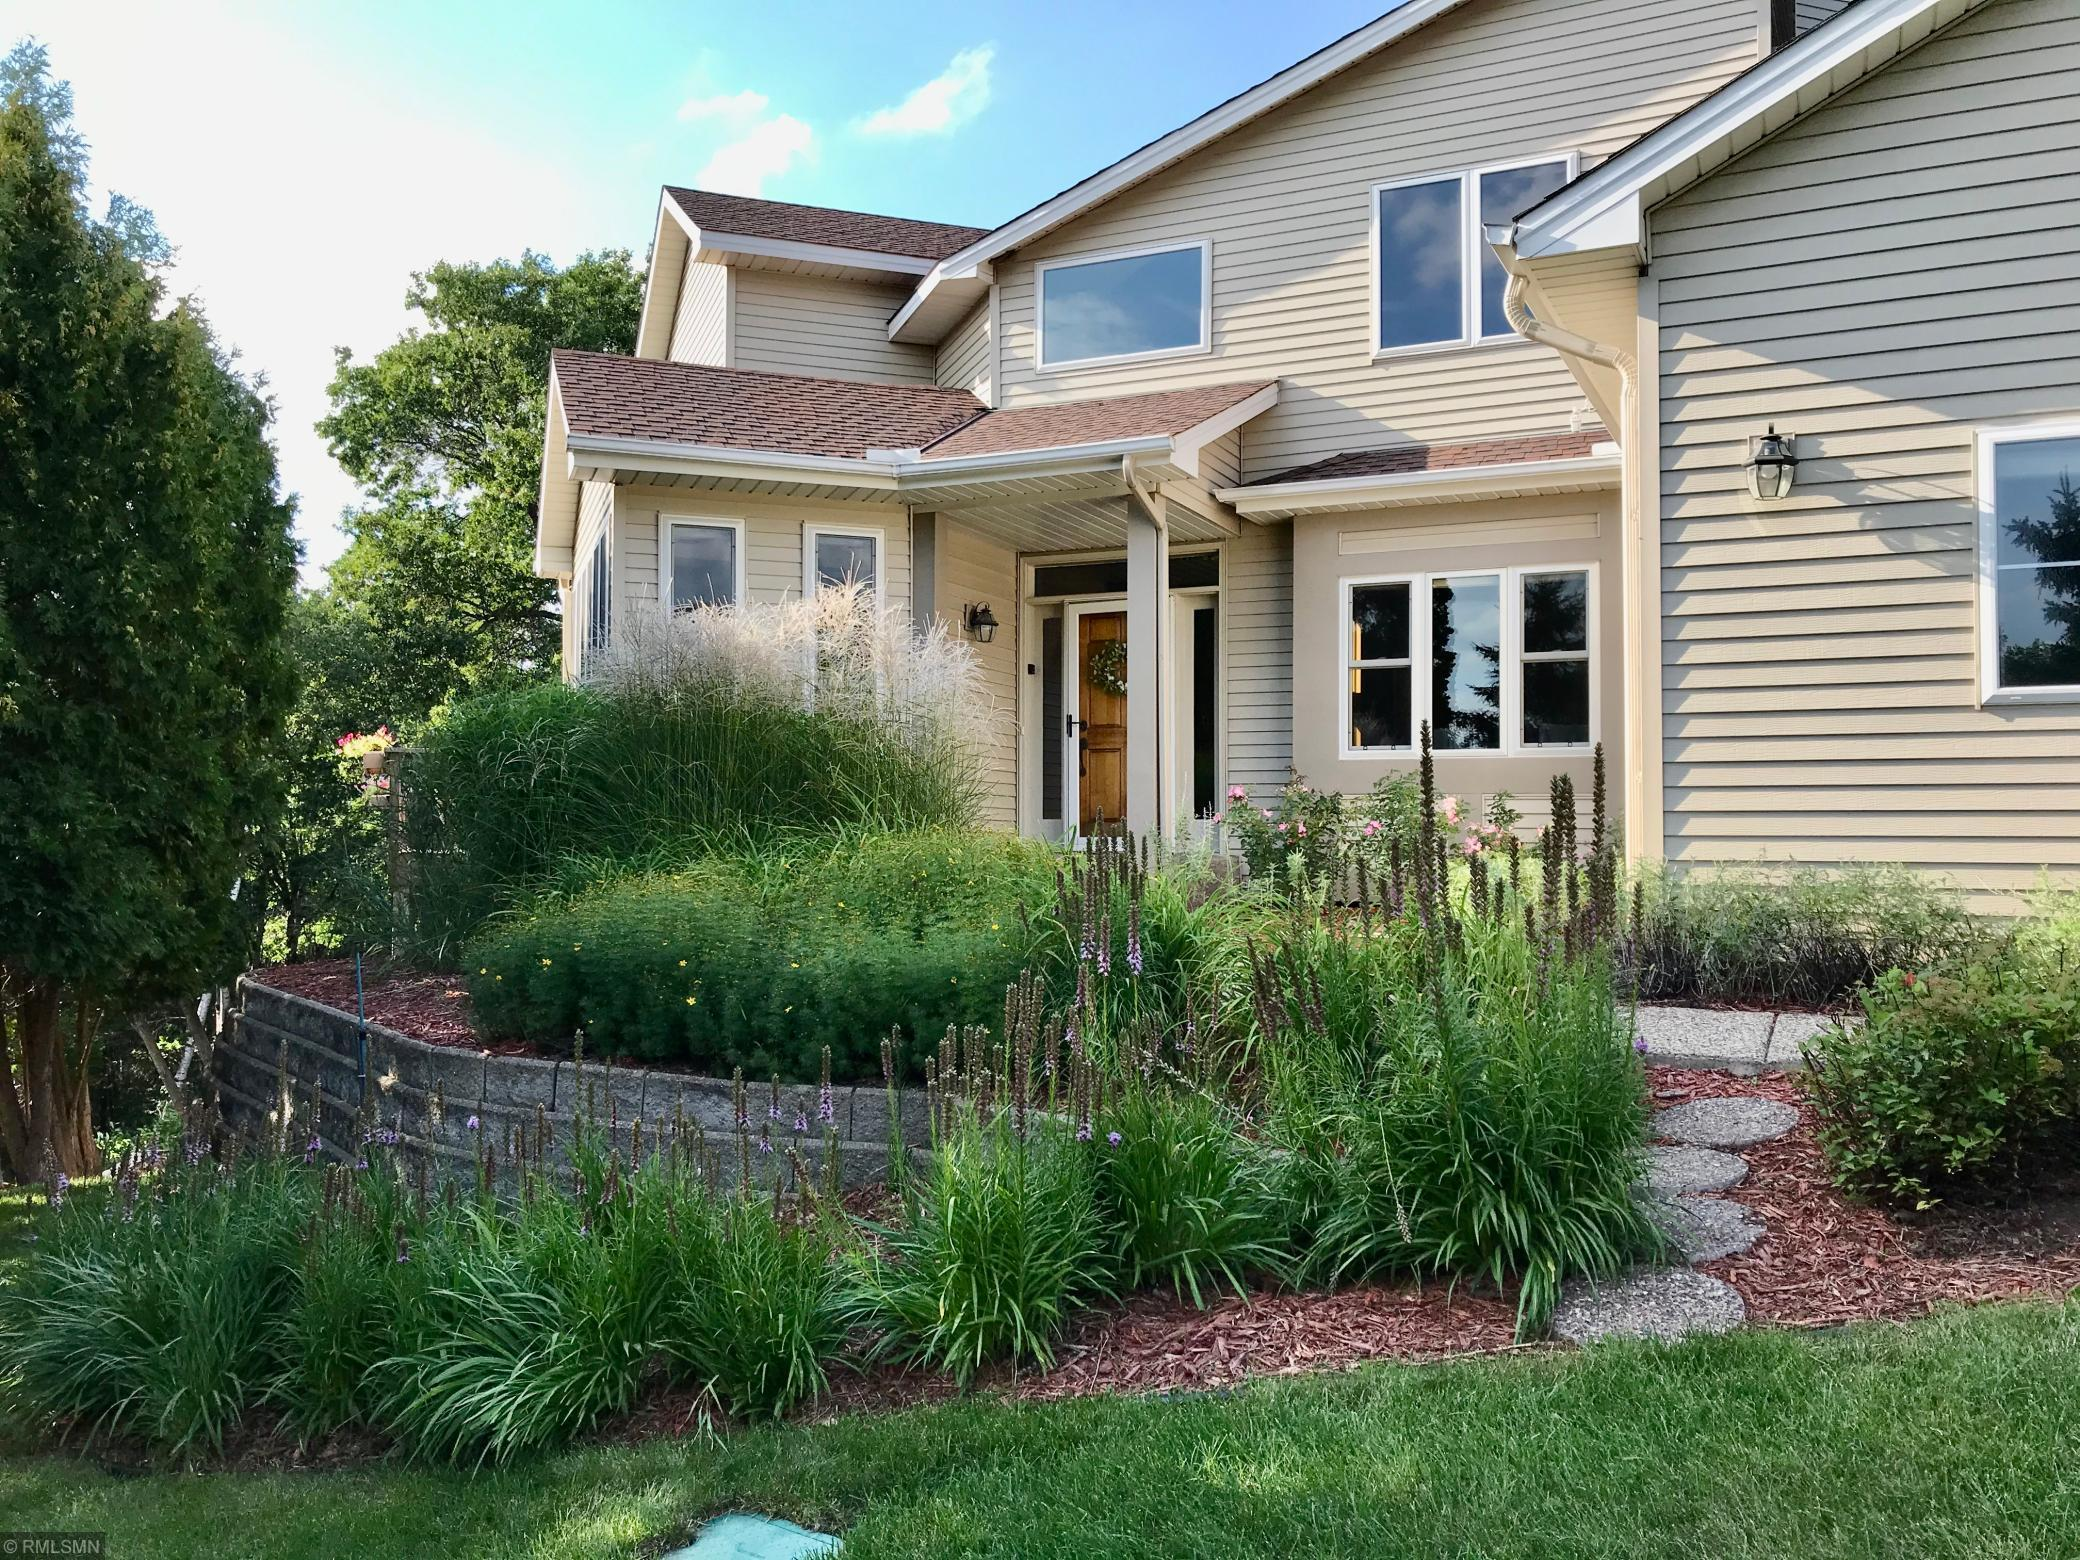 2335 Snowshoe Lane E Property Photo - Maplewood, MN real estate listing